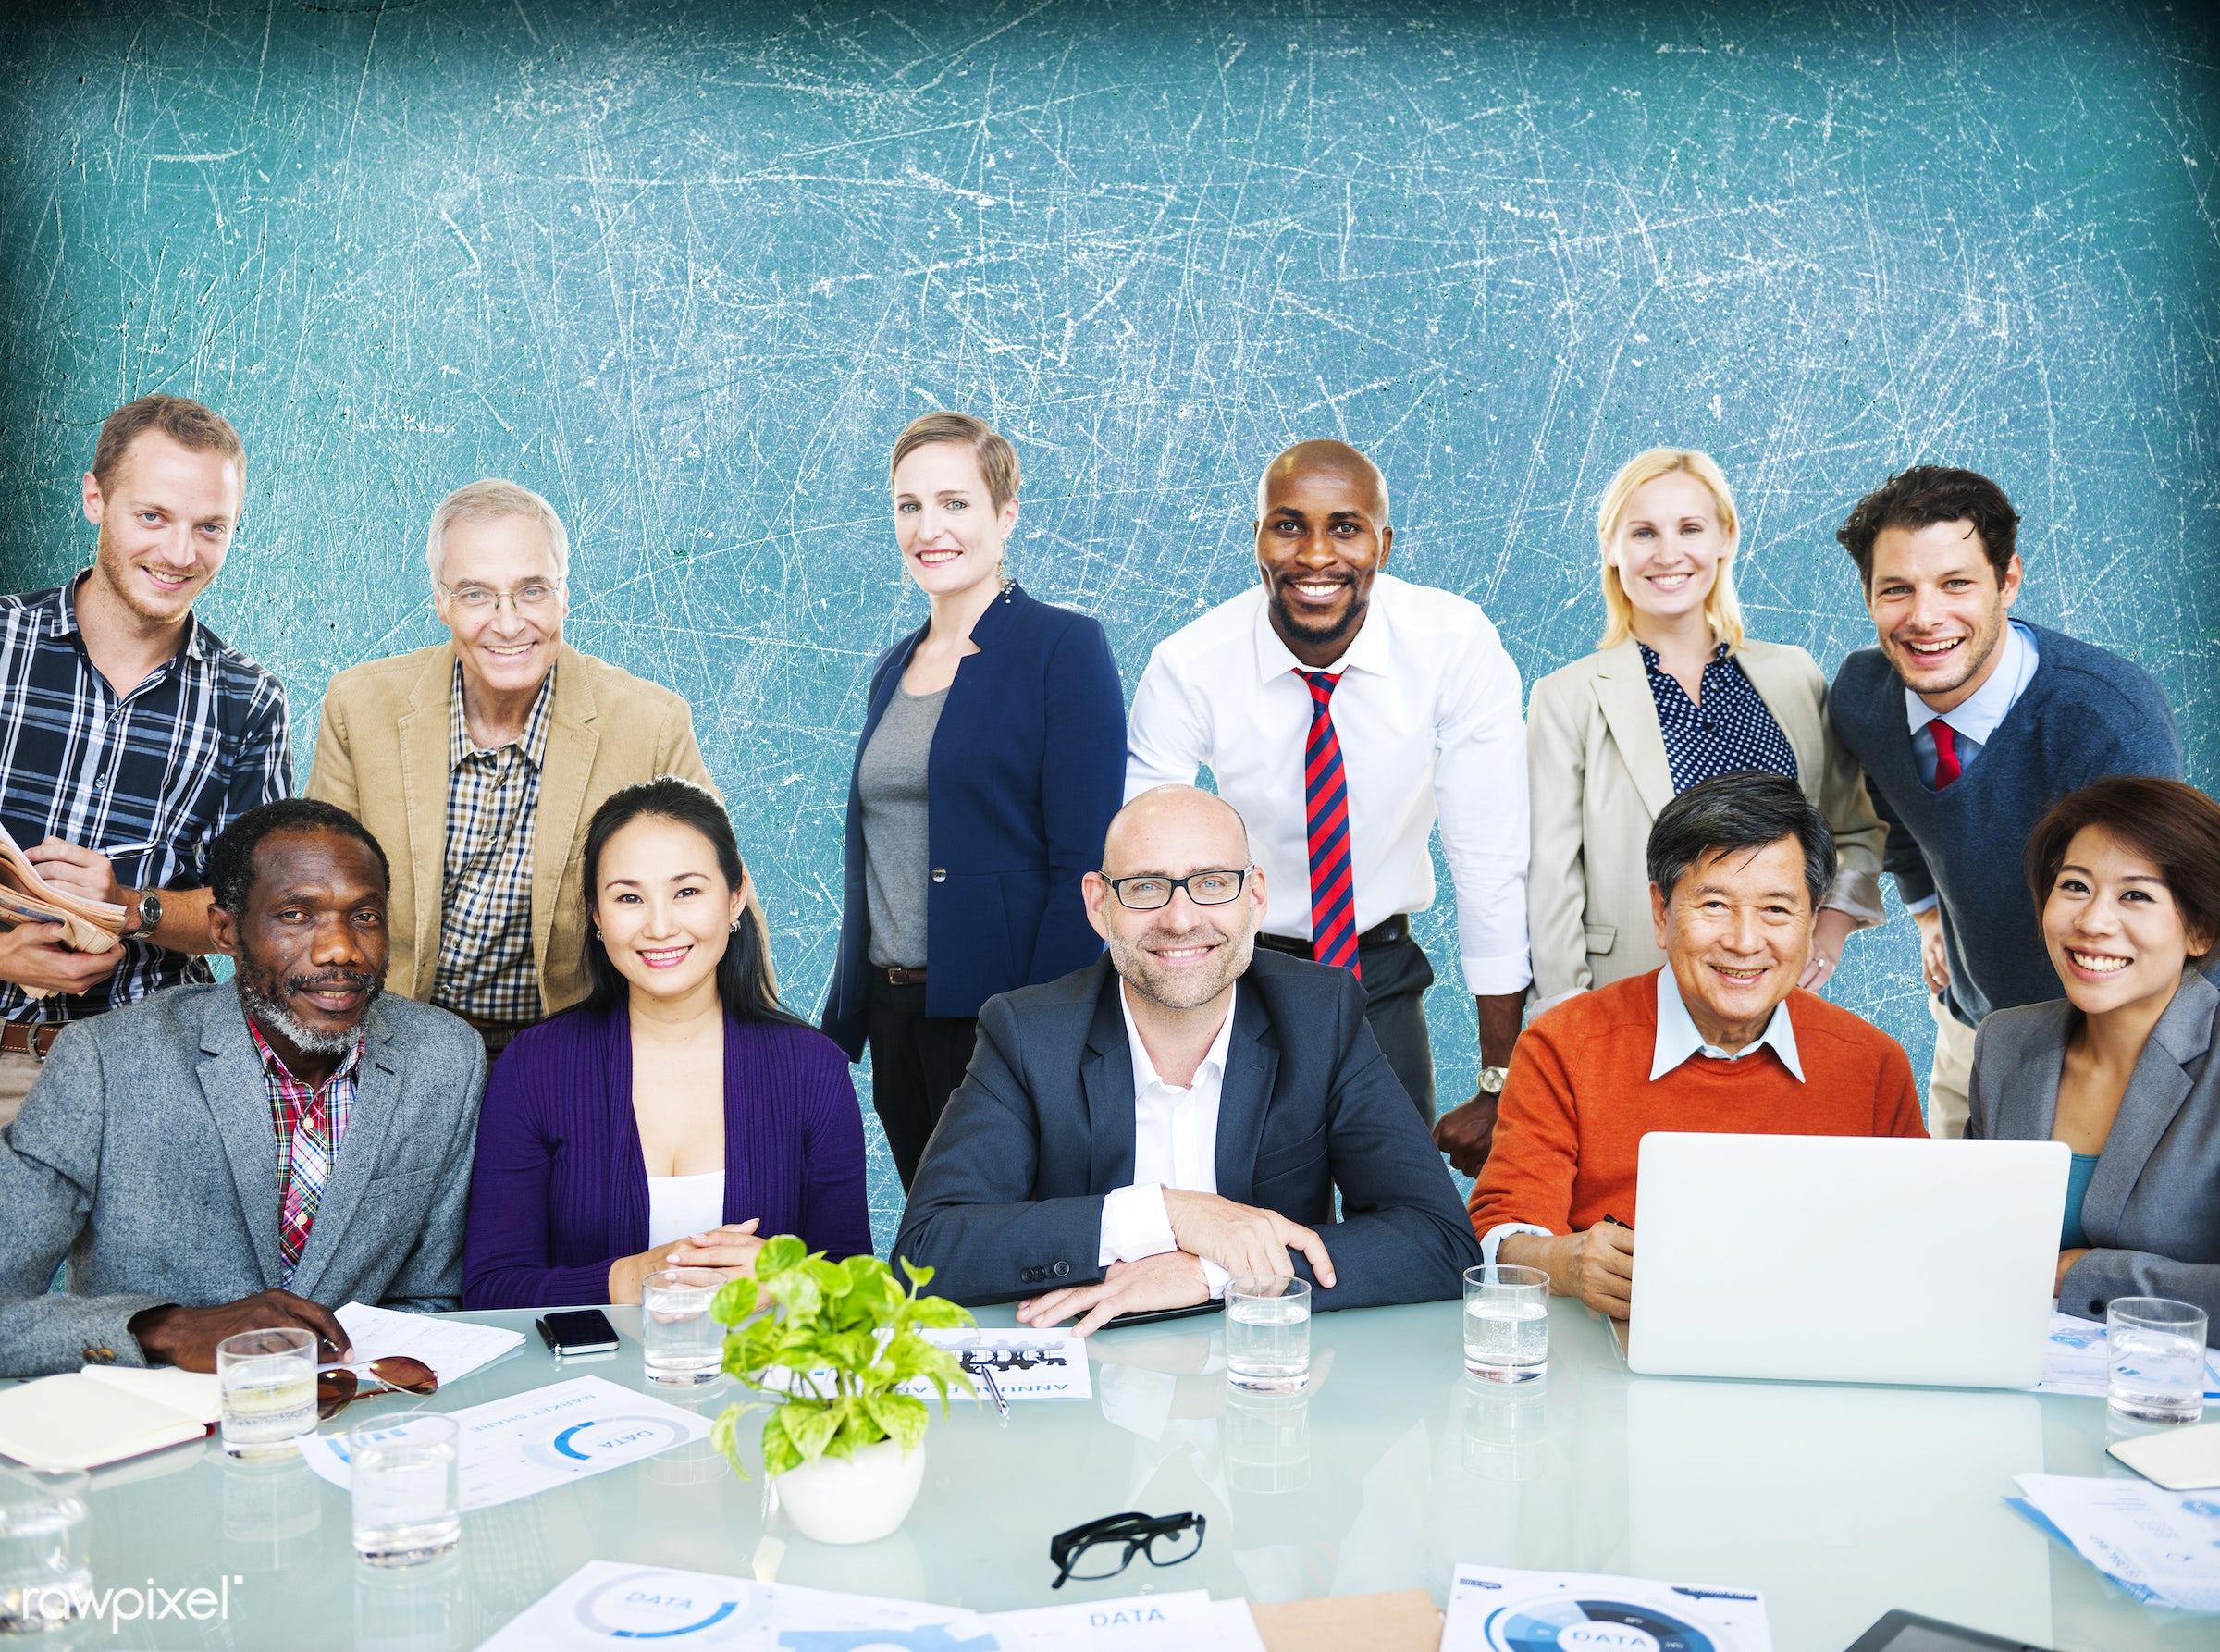 african descent, asian ethnicity, business, business people, businessmen, businesswomen, casual, communication, community,...